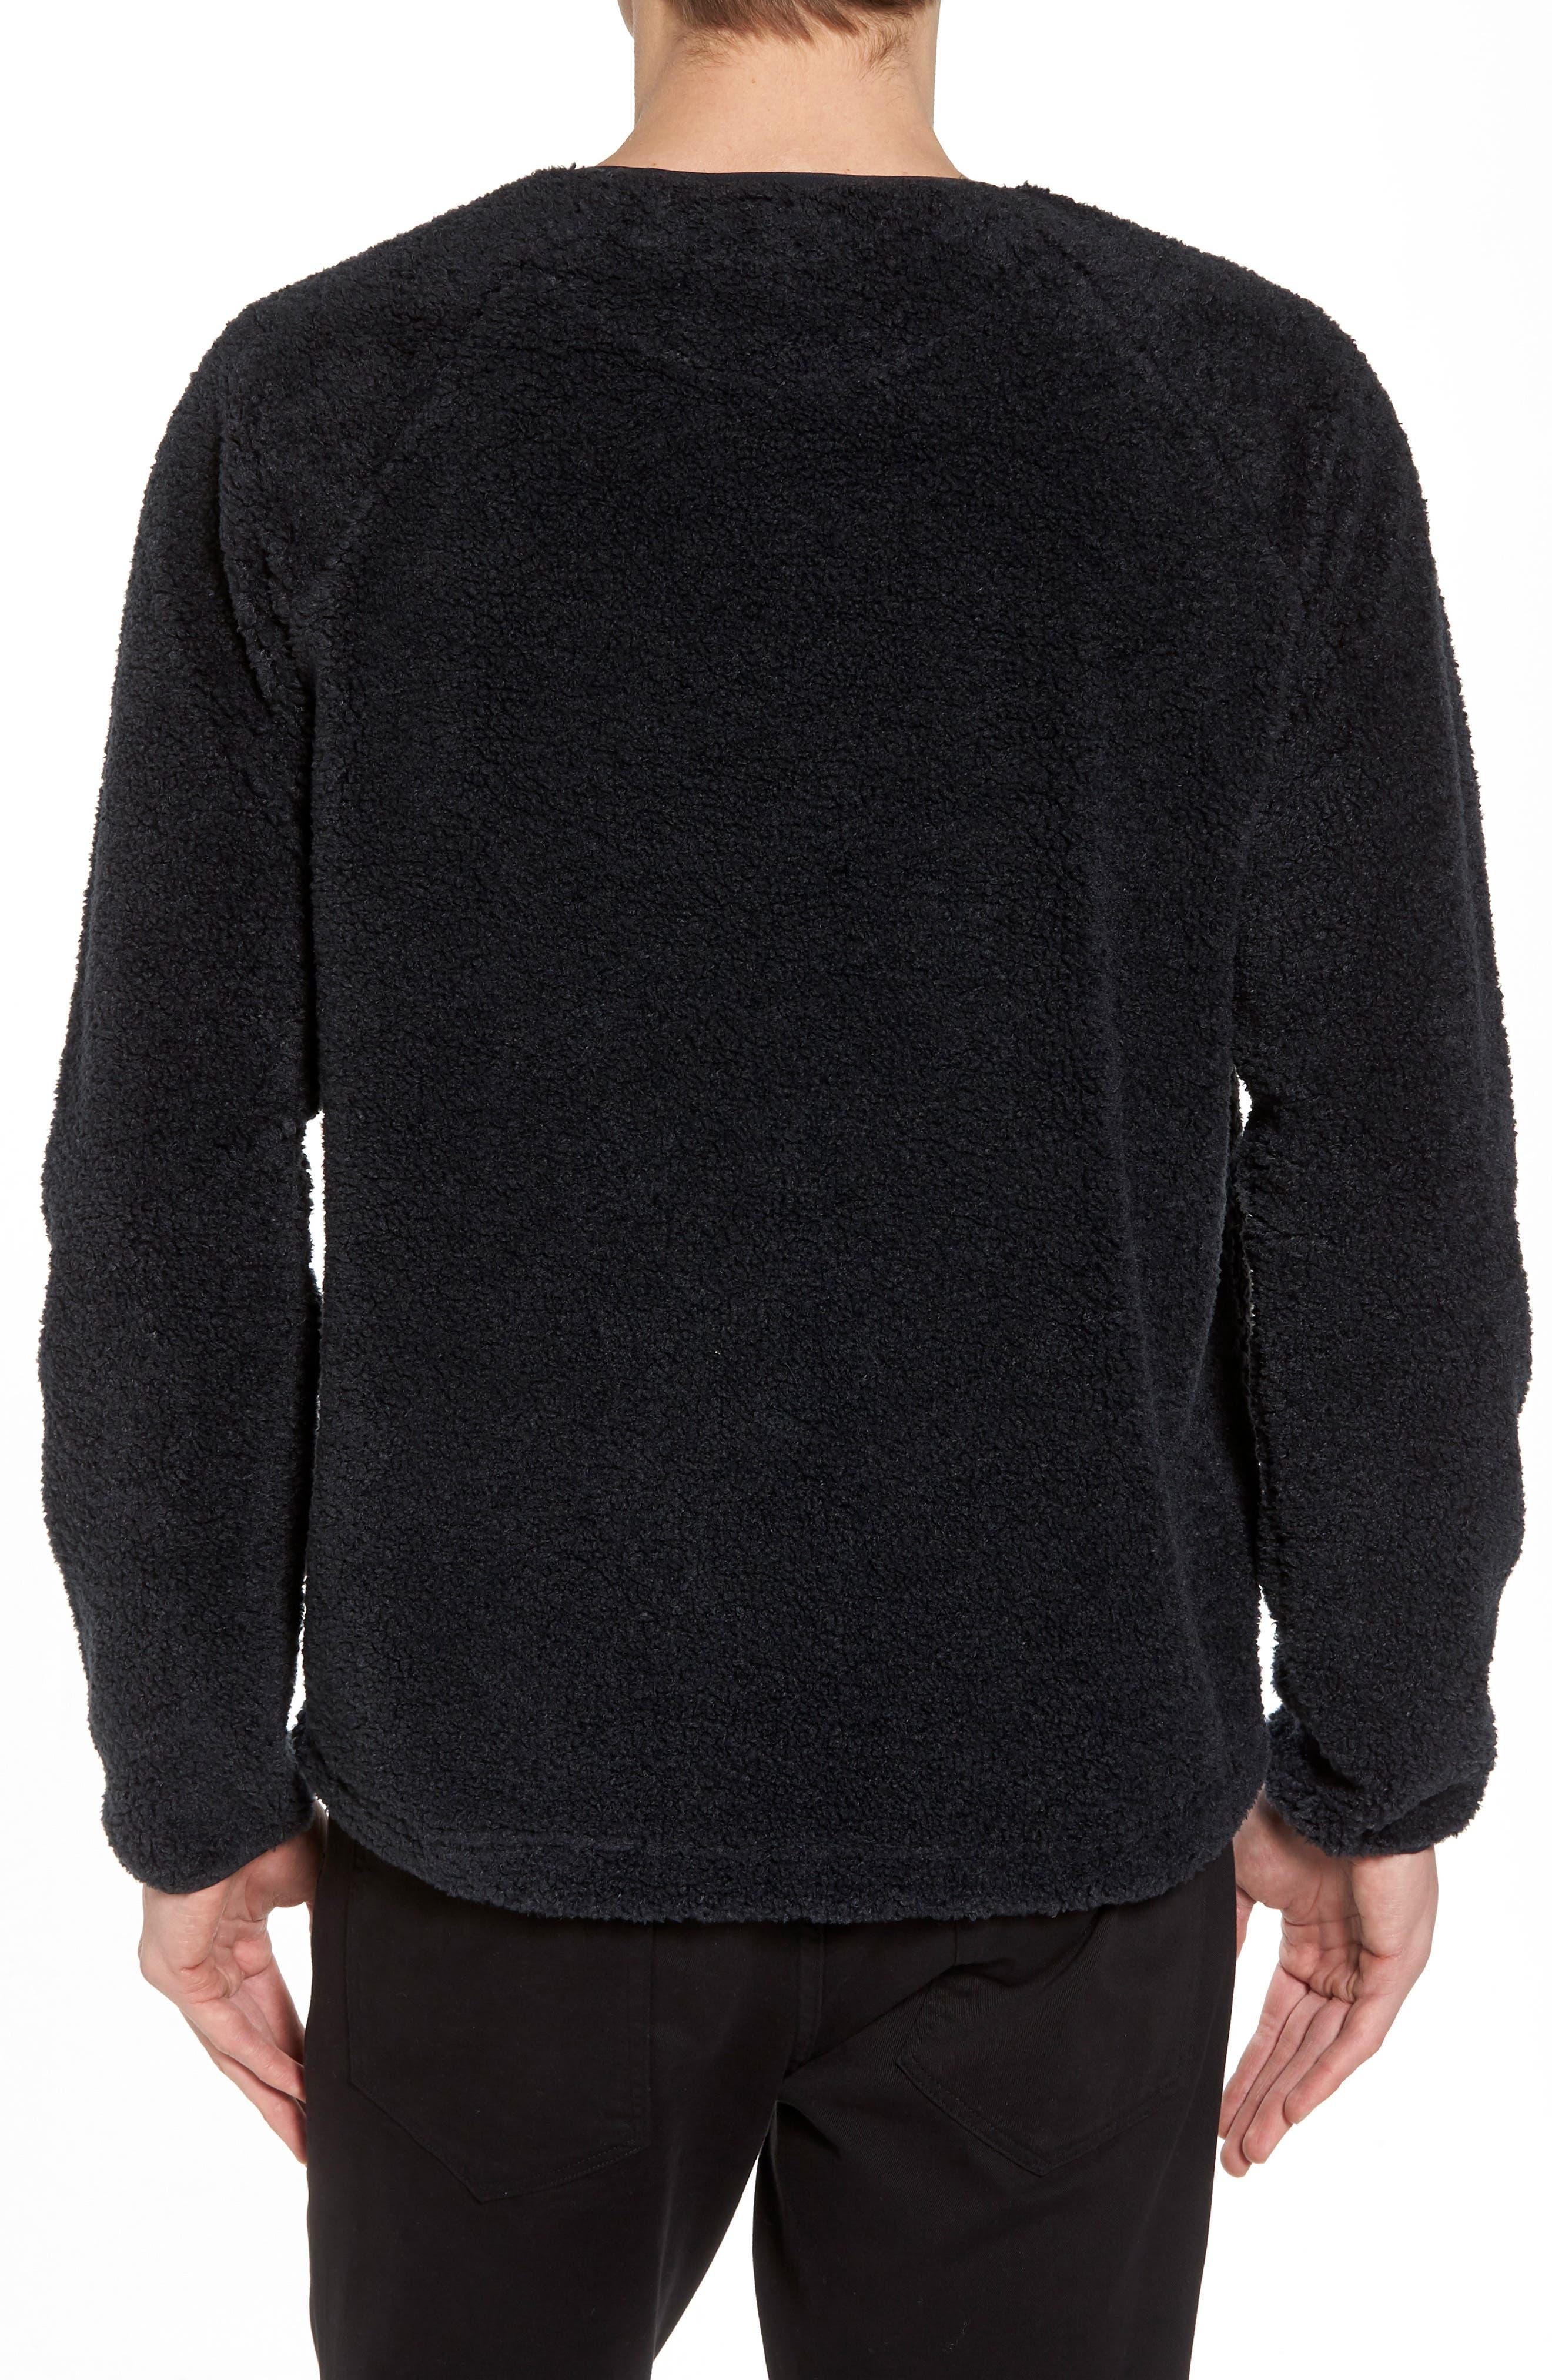 Deliverance Fleece Sweatshirt,                             Alternate thumbnail 2, color,